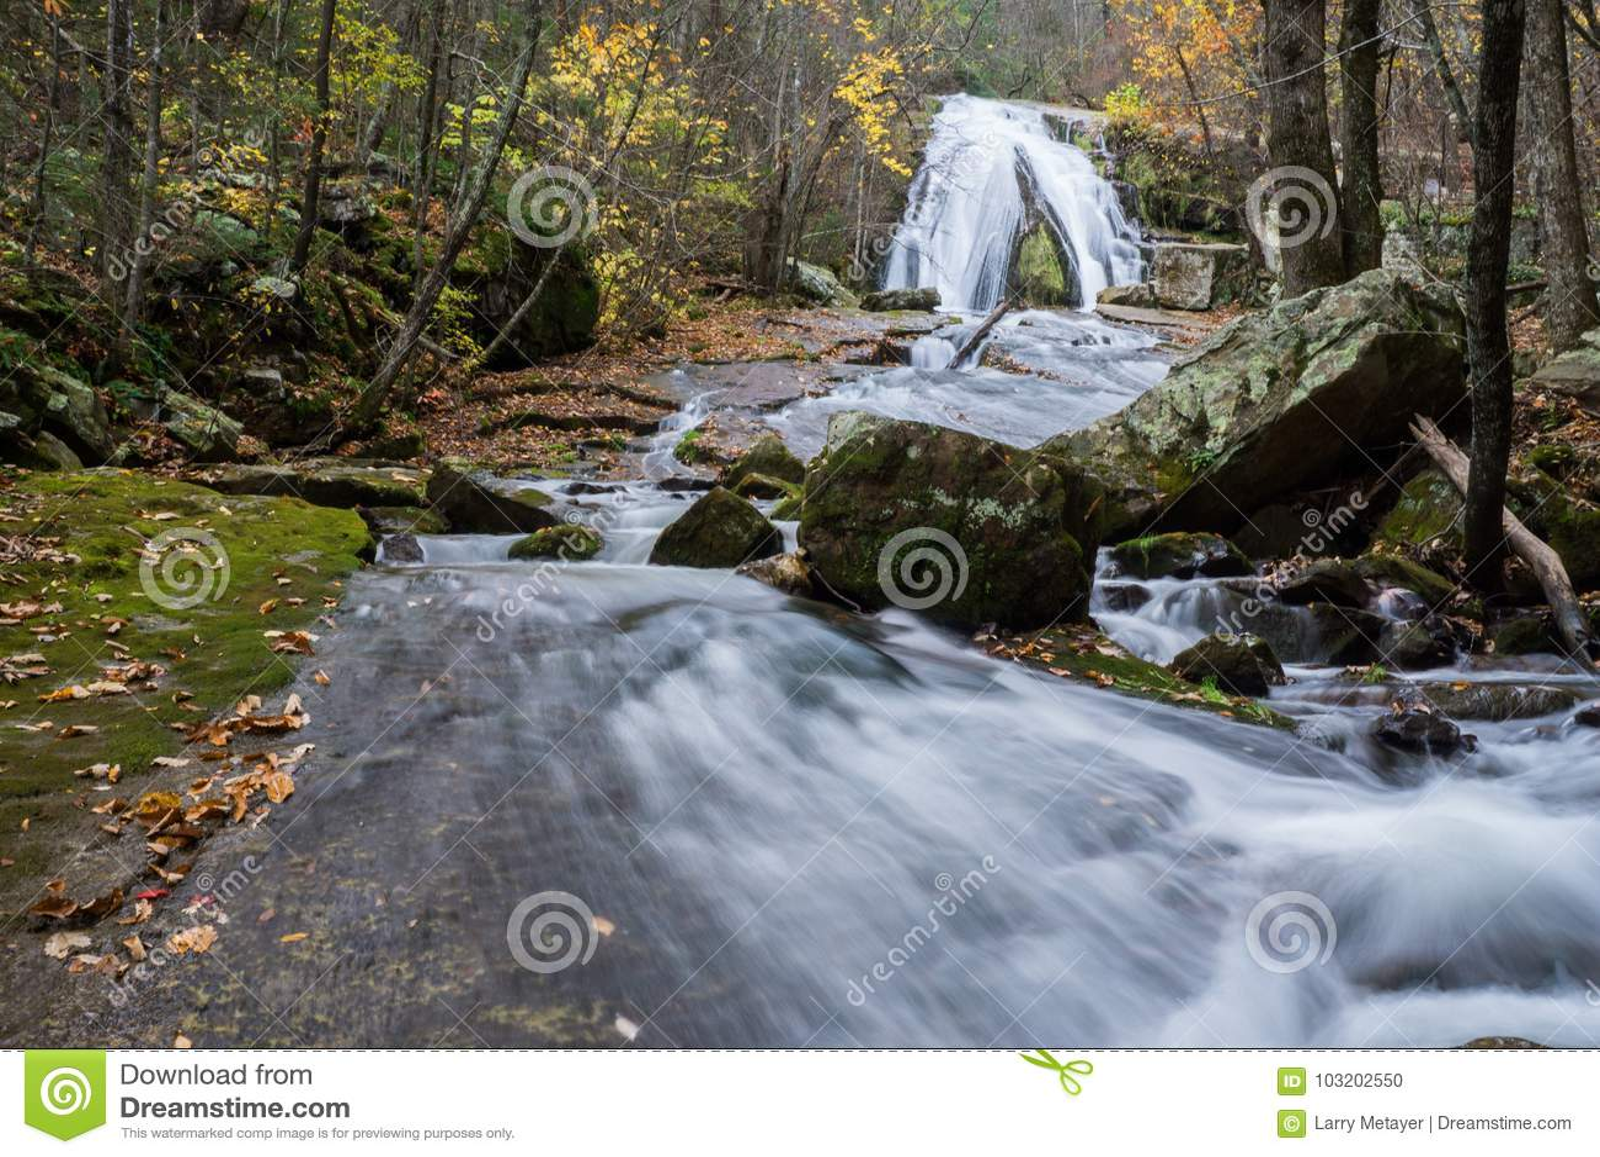 Een de herfstmening van het Gebrul van In werking gestelde die Waterval in Eagle Rock in Botetourt-Provincie, Virginia wordt geve